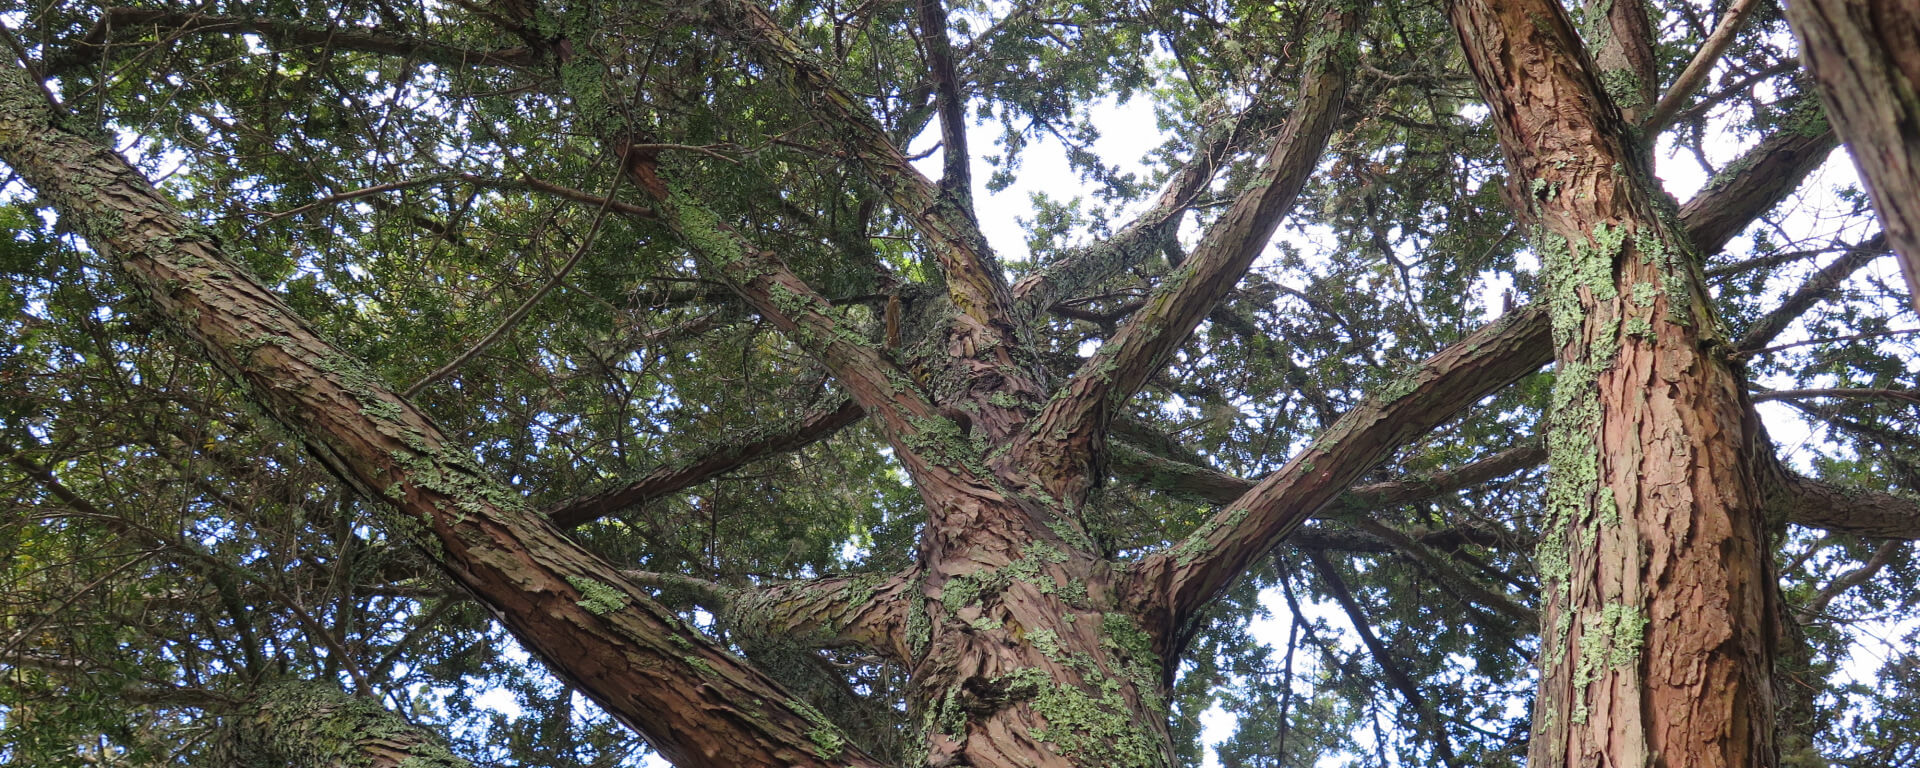 """gardening with new zealand plants shrubs and trees""; Tōtara Podocarpus Totara The Meaning Of Trees"